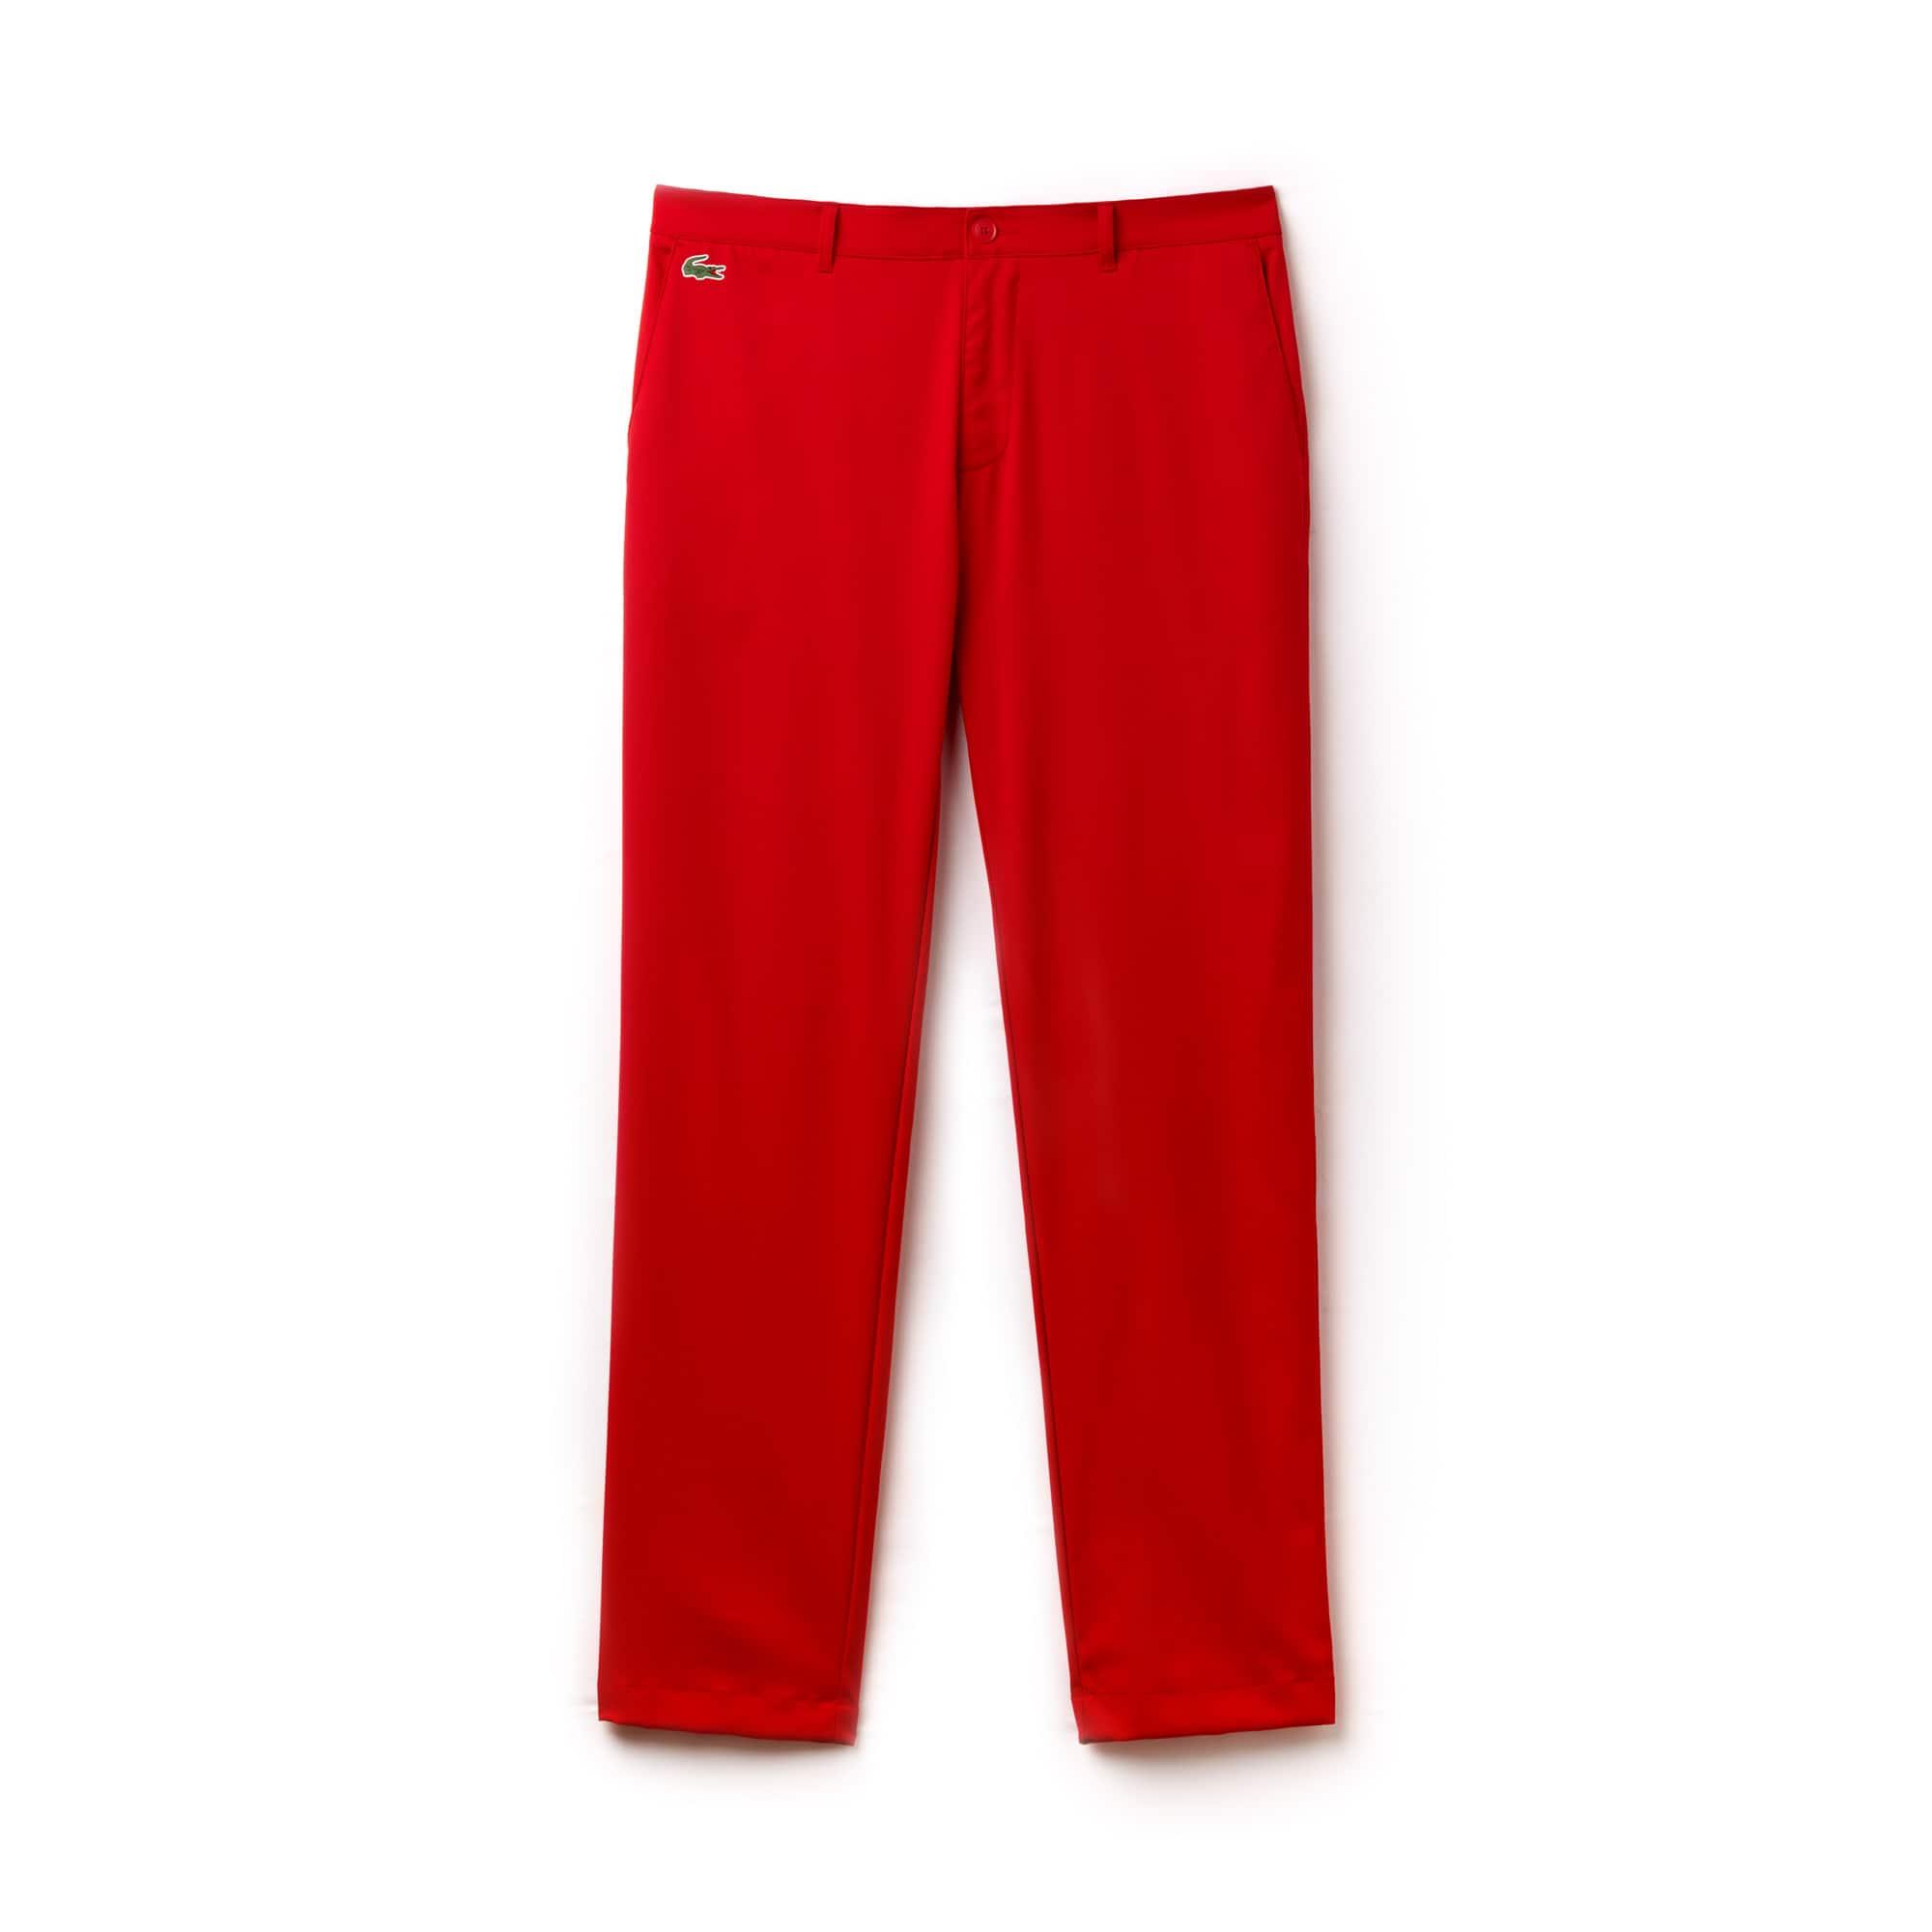 Pantalon chino Golf Lacoste SPORT en gabardine technique ultra dry uni